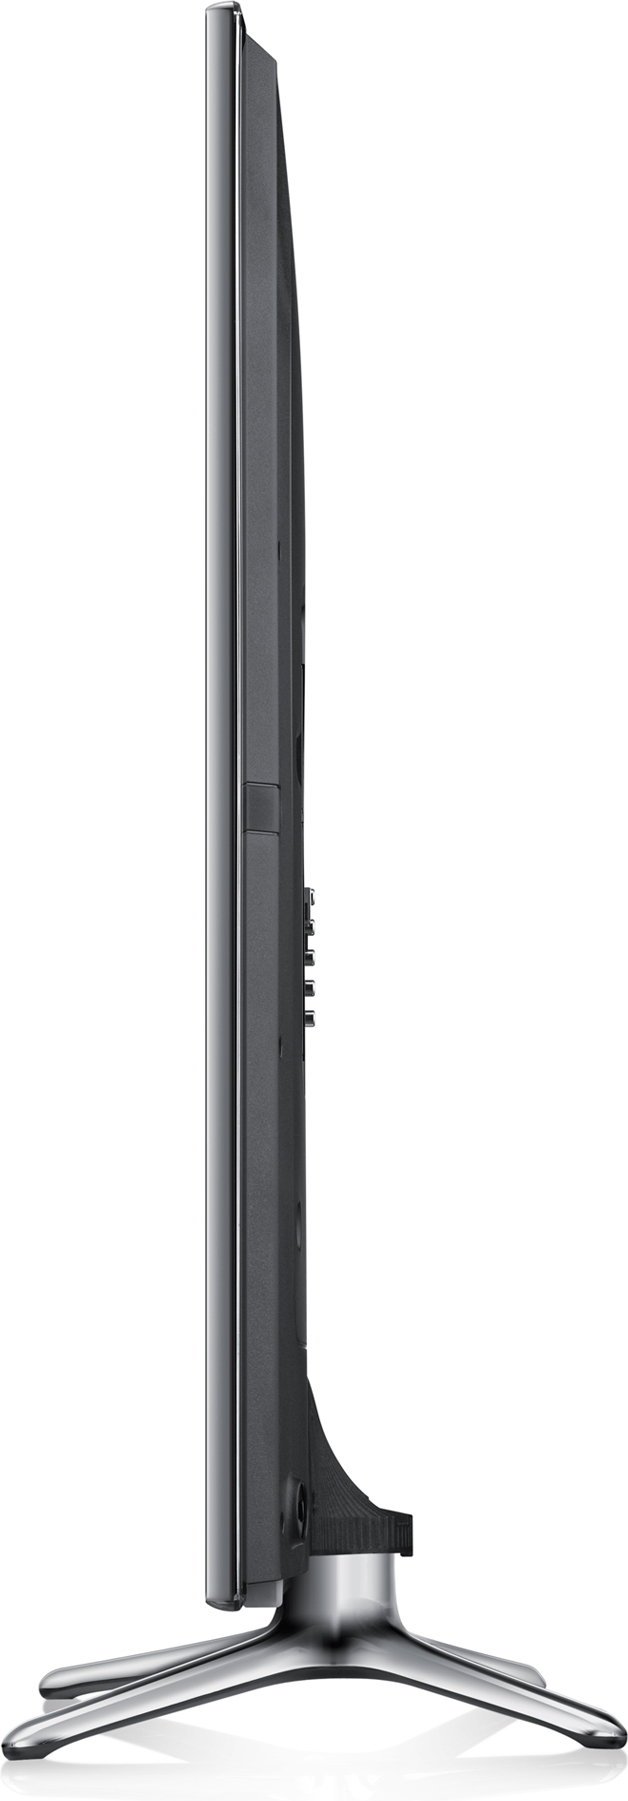 Samsung UE55F6500